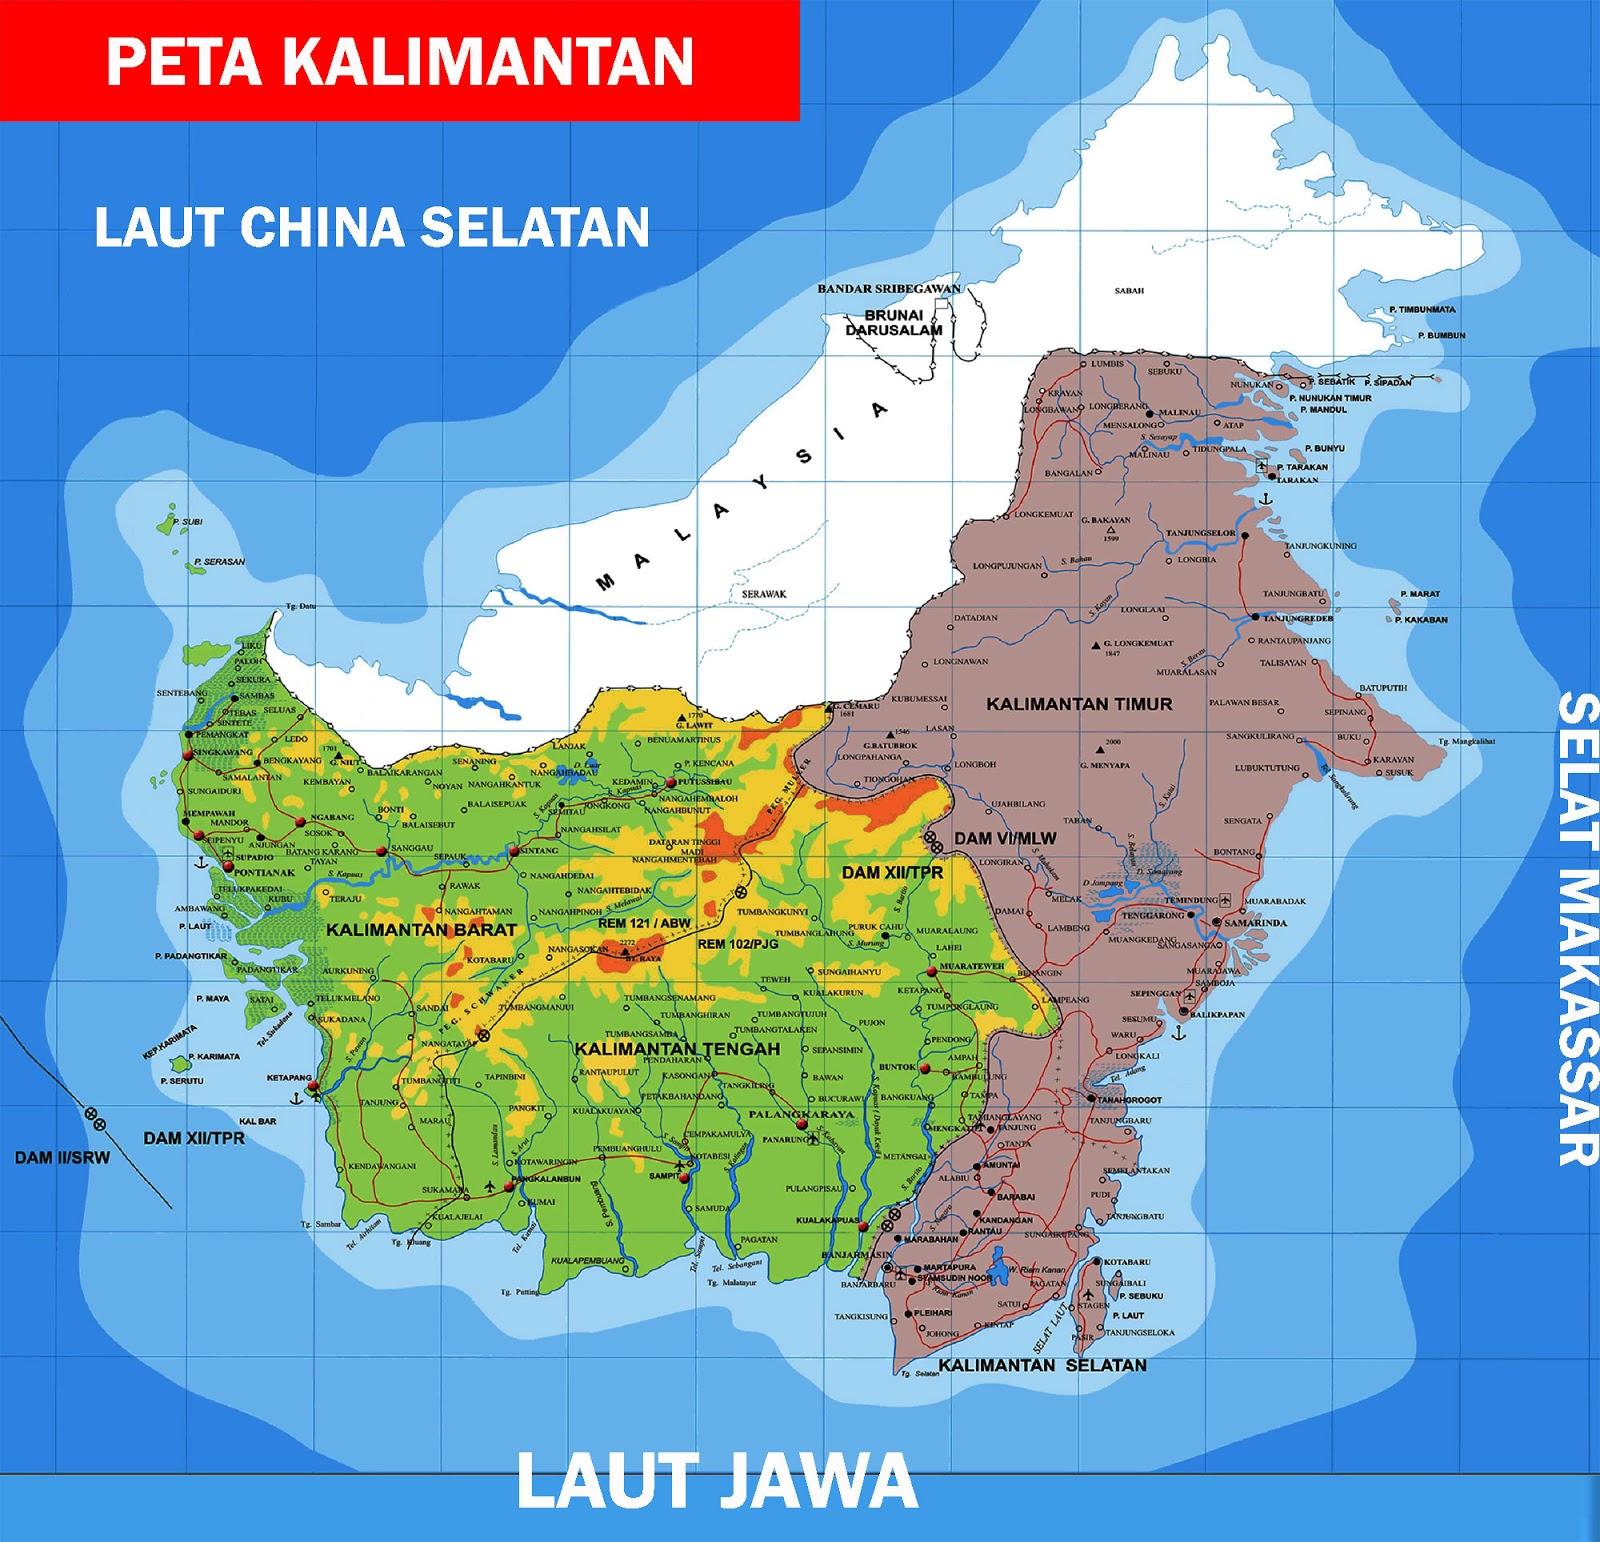 Peta Kalimantan Lengkap 5 Provinsi Sejarah Negara Gambar Sketsa Pulau